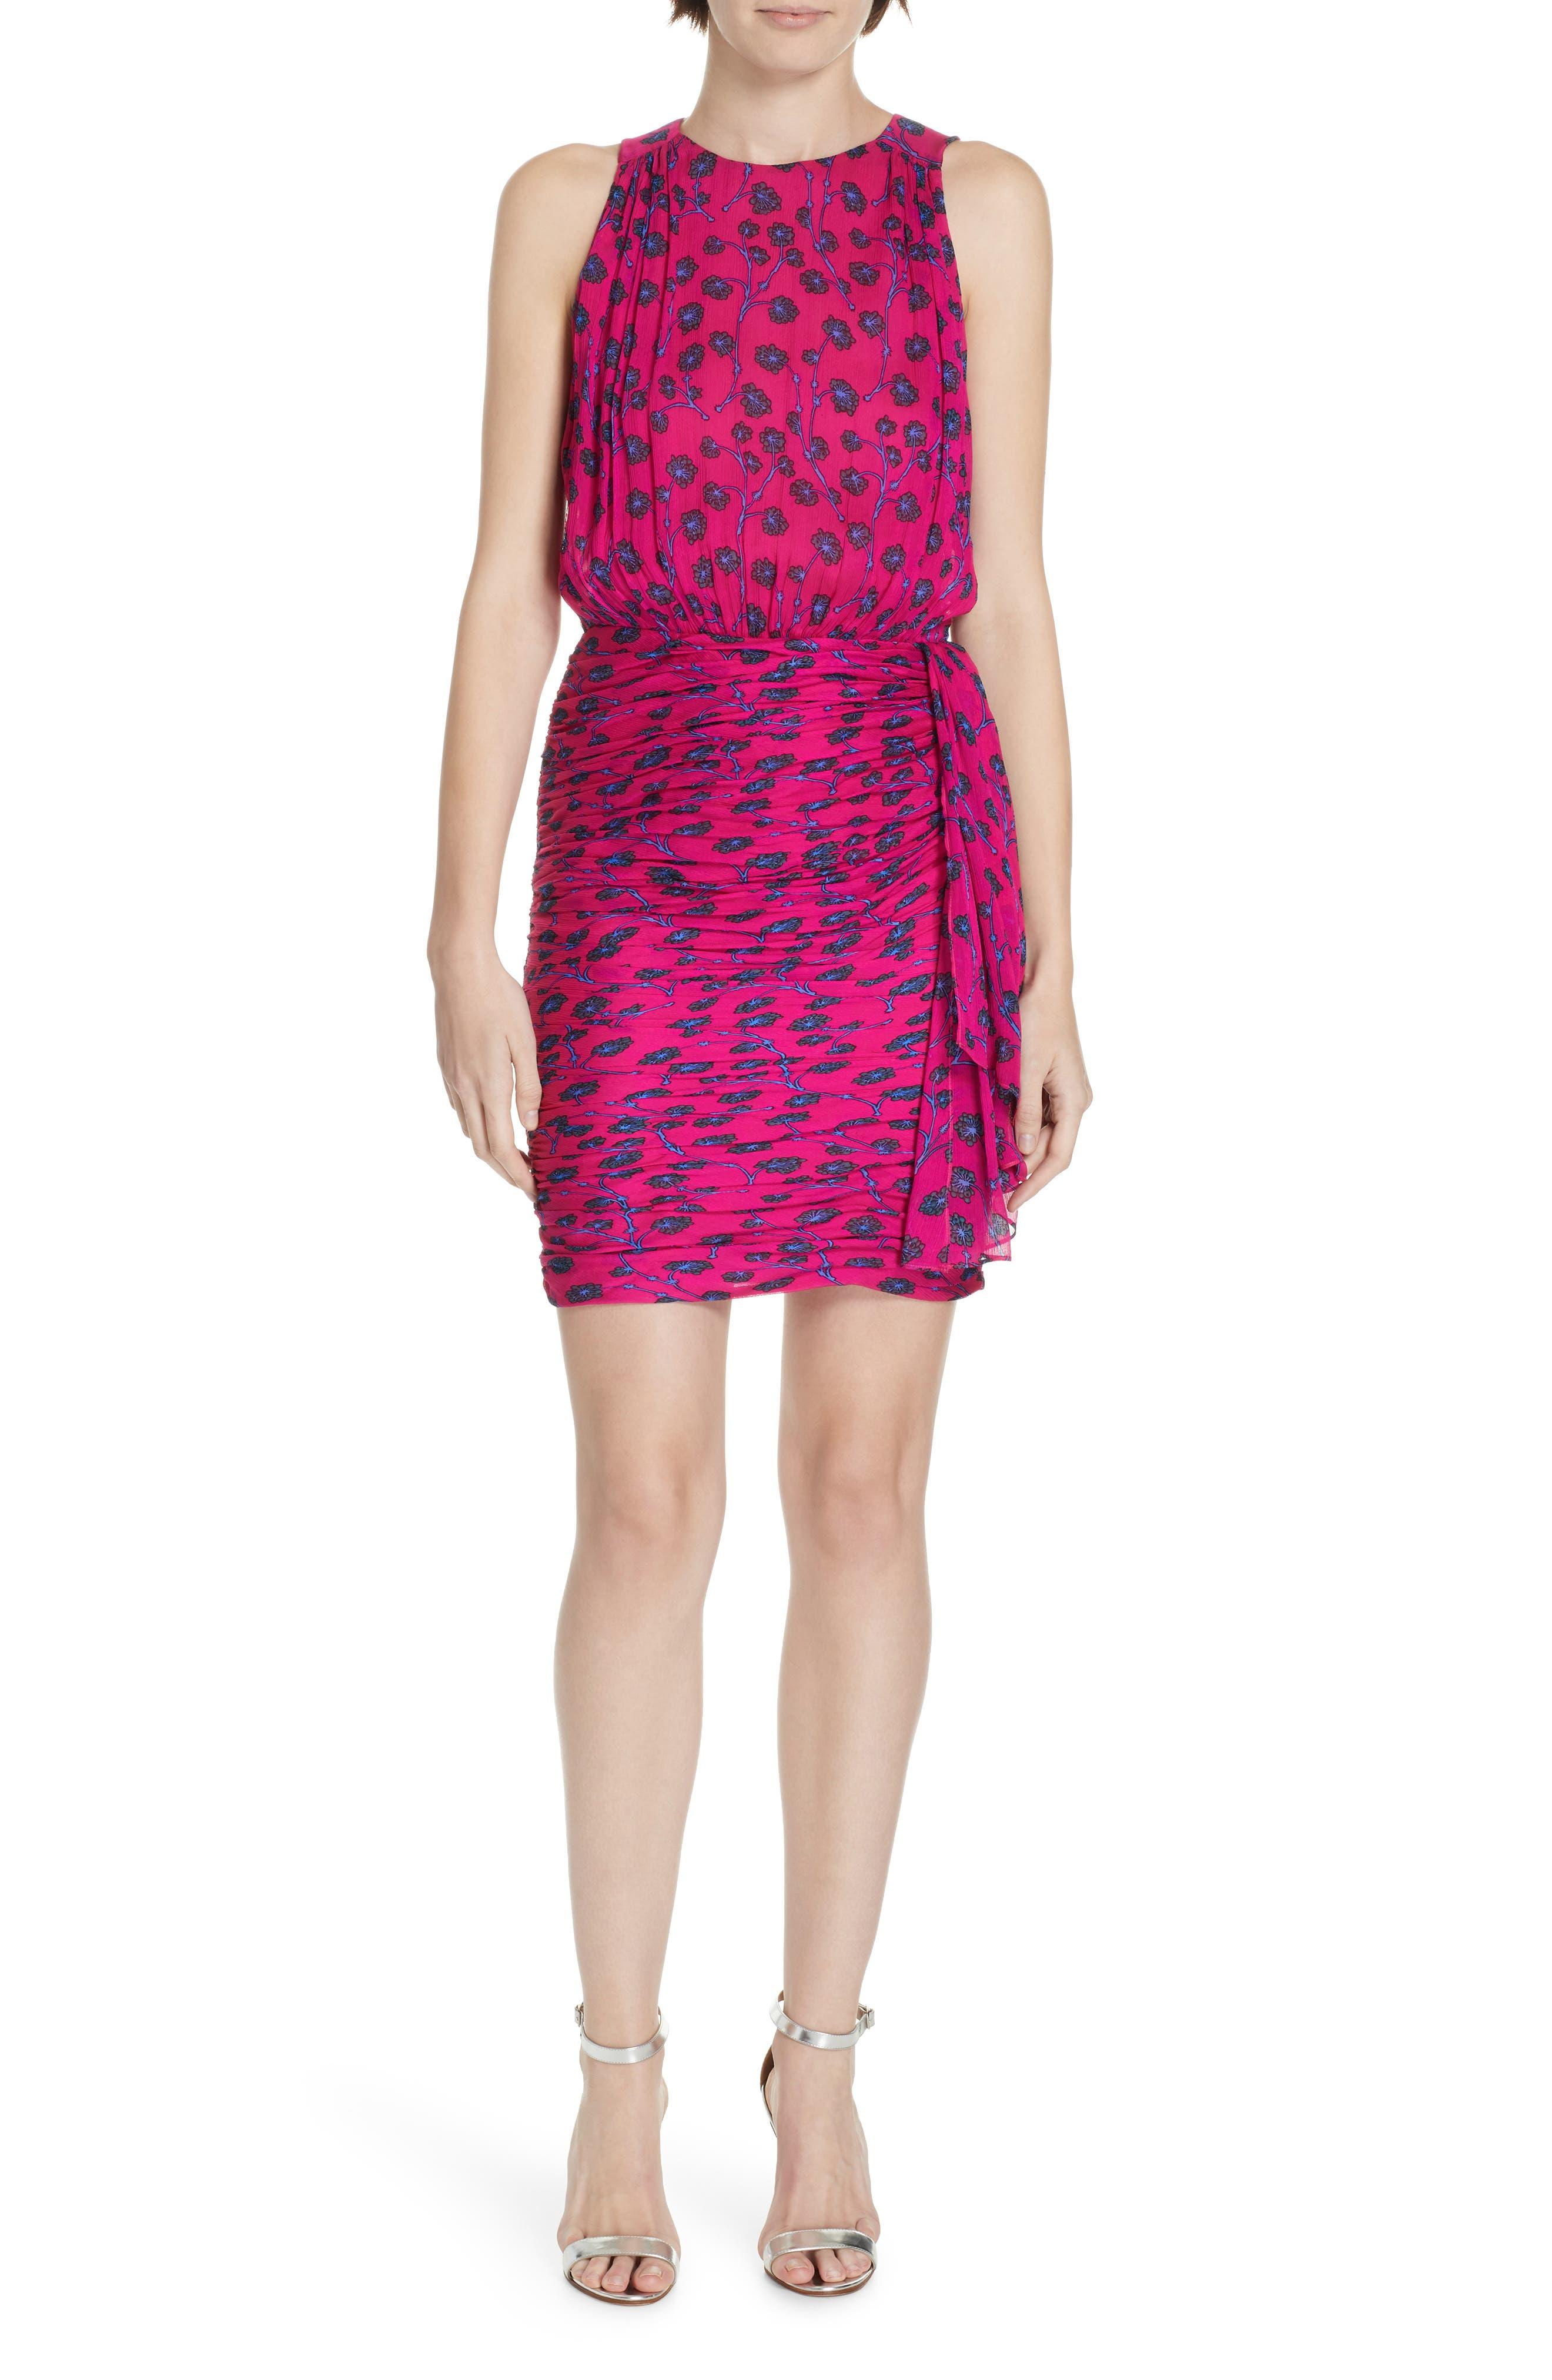 Micah Ruched Blouson Dress,                             Main thumbnail 1, color,                             DRAGON BERRY DITSY PINK